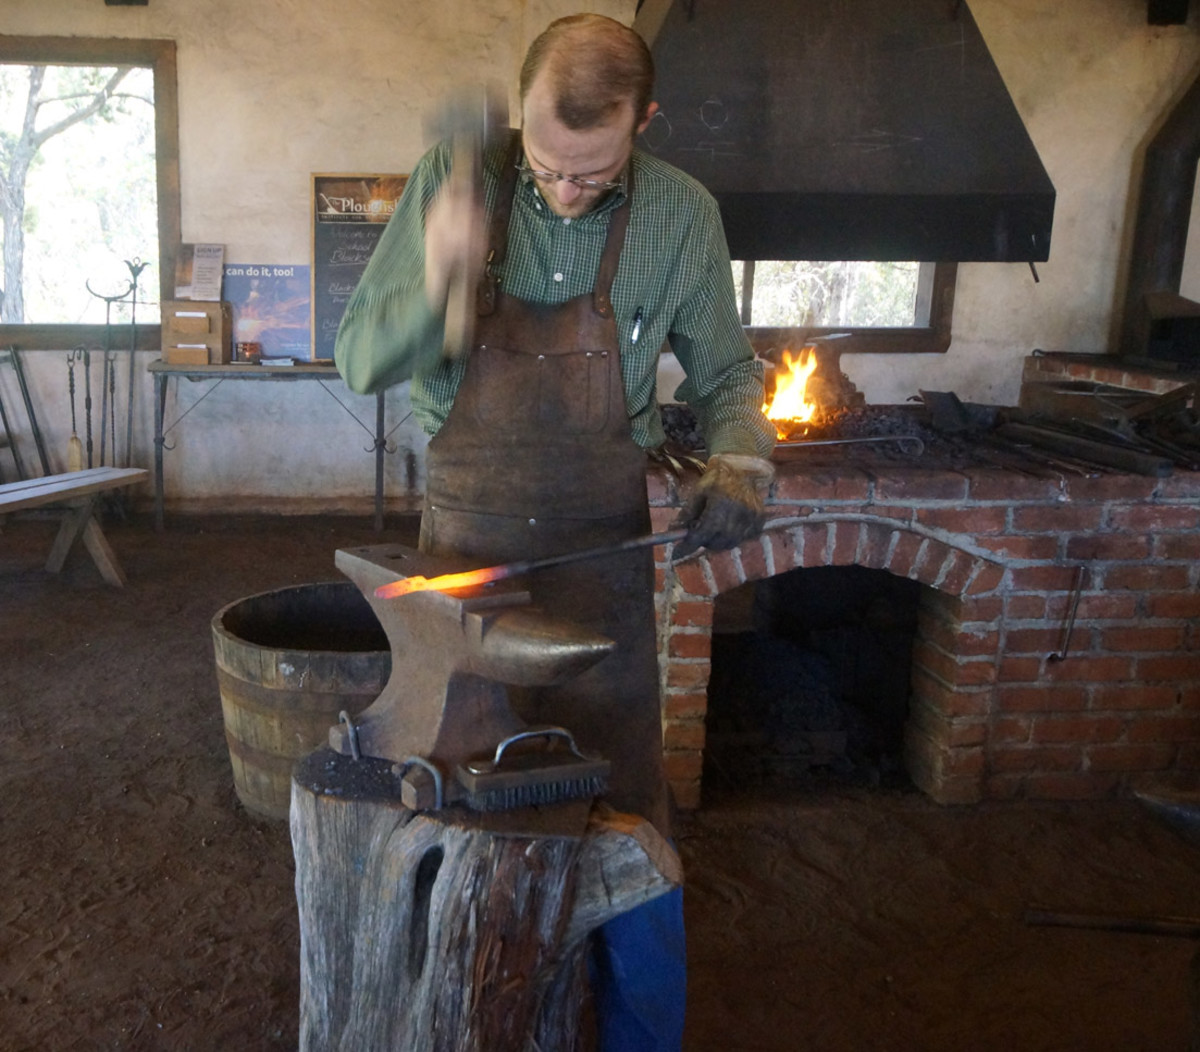 Blacksmith forging the spoon handle.